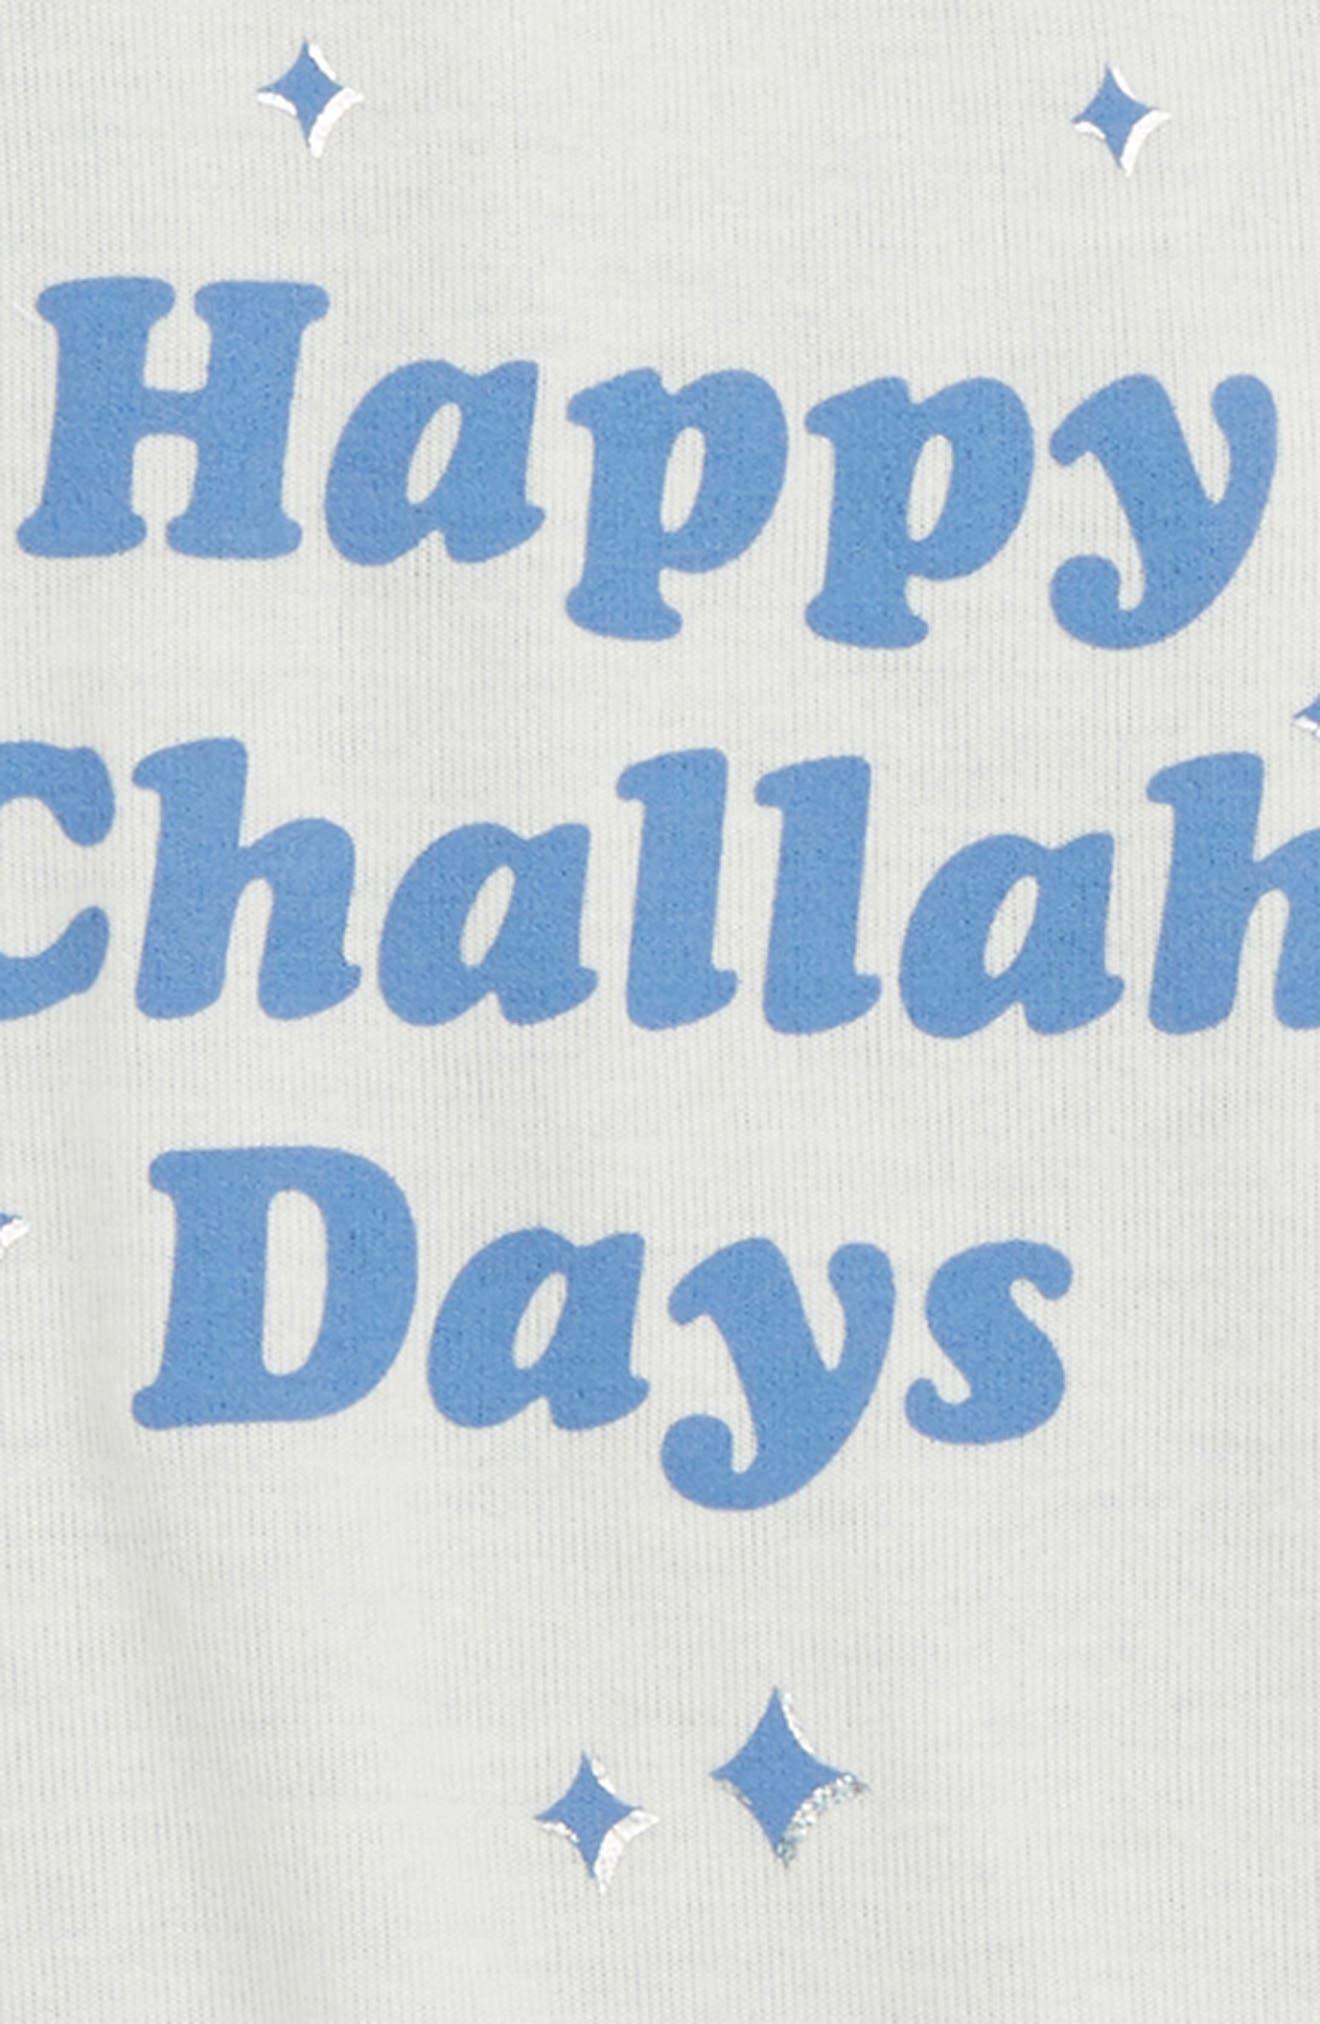 Happy Challah Days Baseball Tee,                             Alternate thumbnail 2, color,                             BLUE/ IVORY